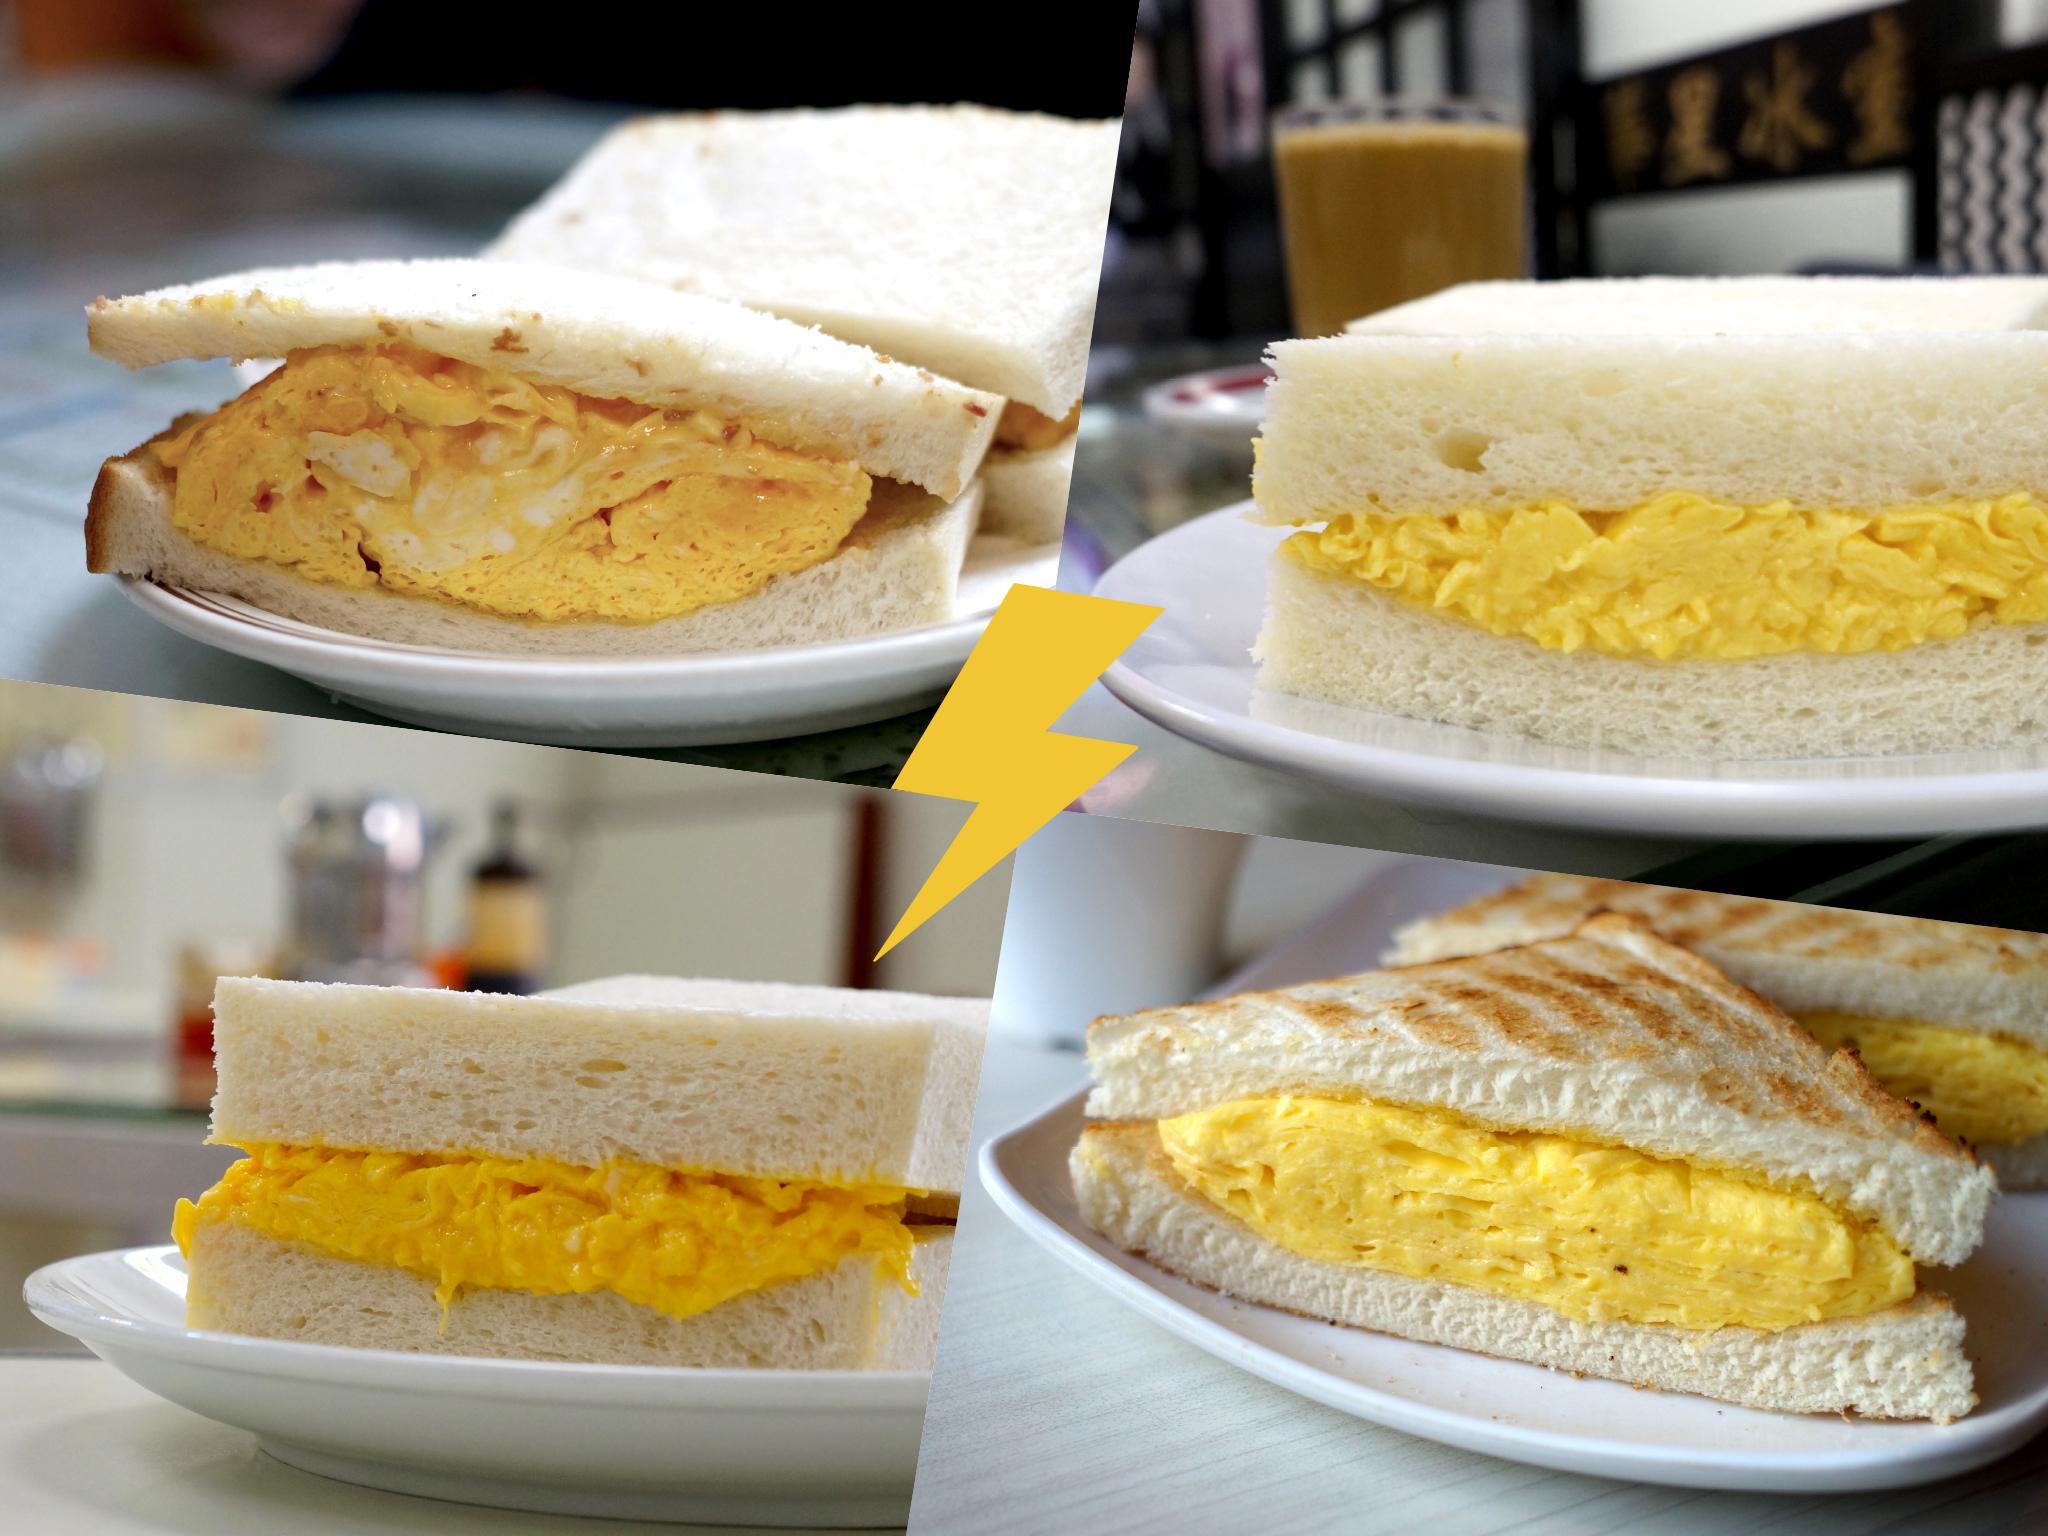 四大蛋治王, Egg Sandwich